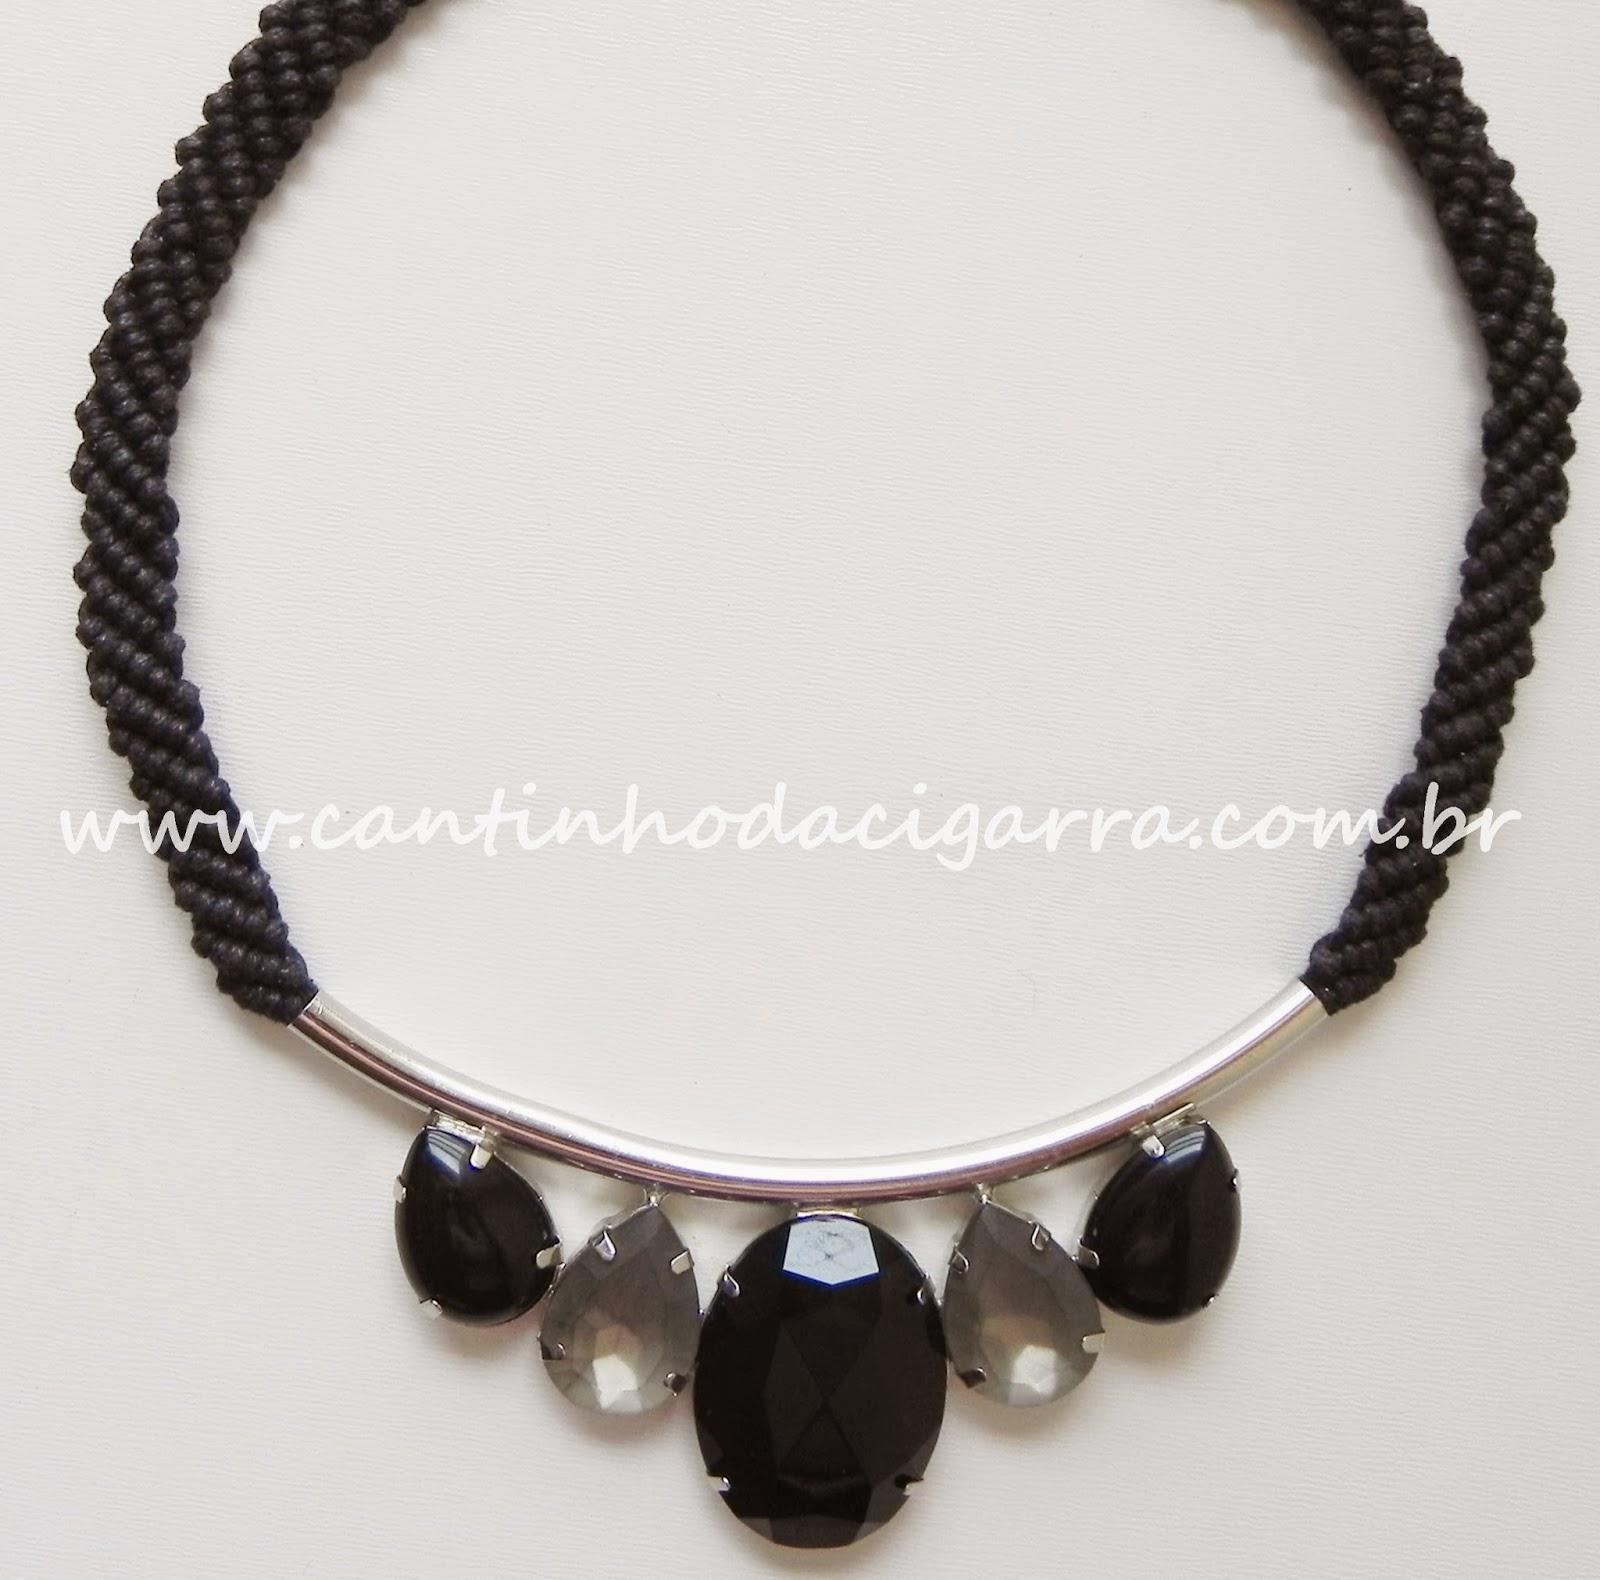 http://www.cantinhodacigarra.com.br/